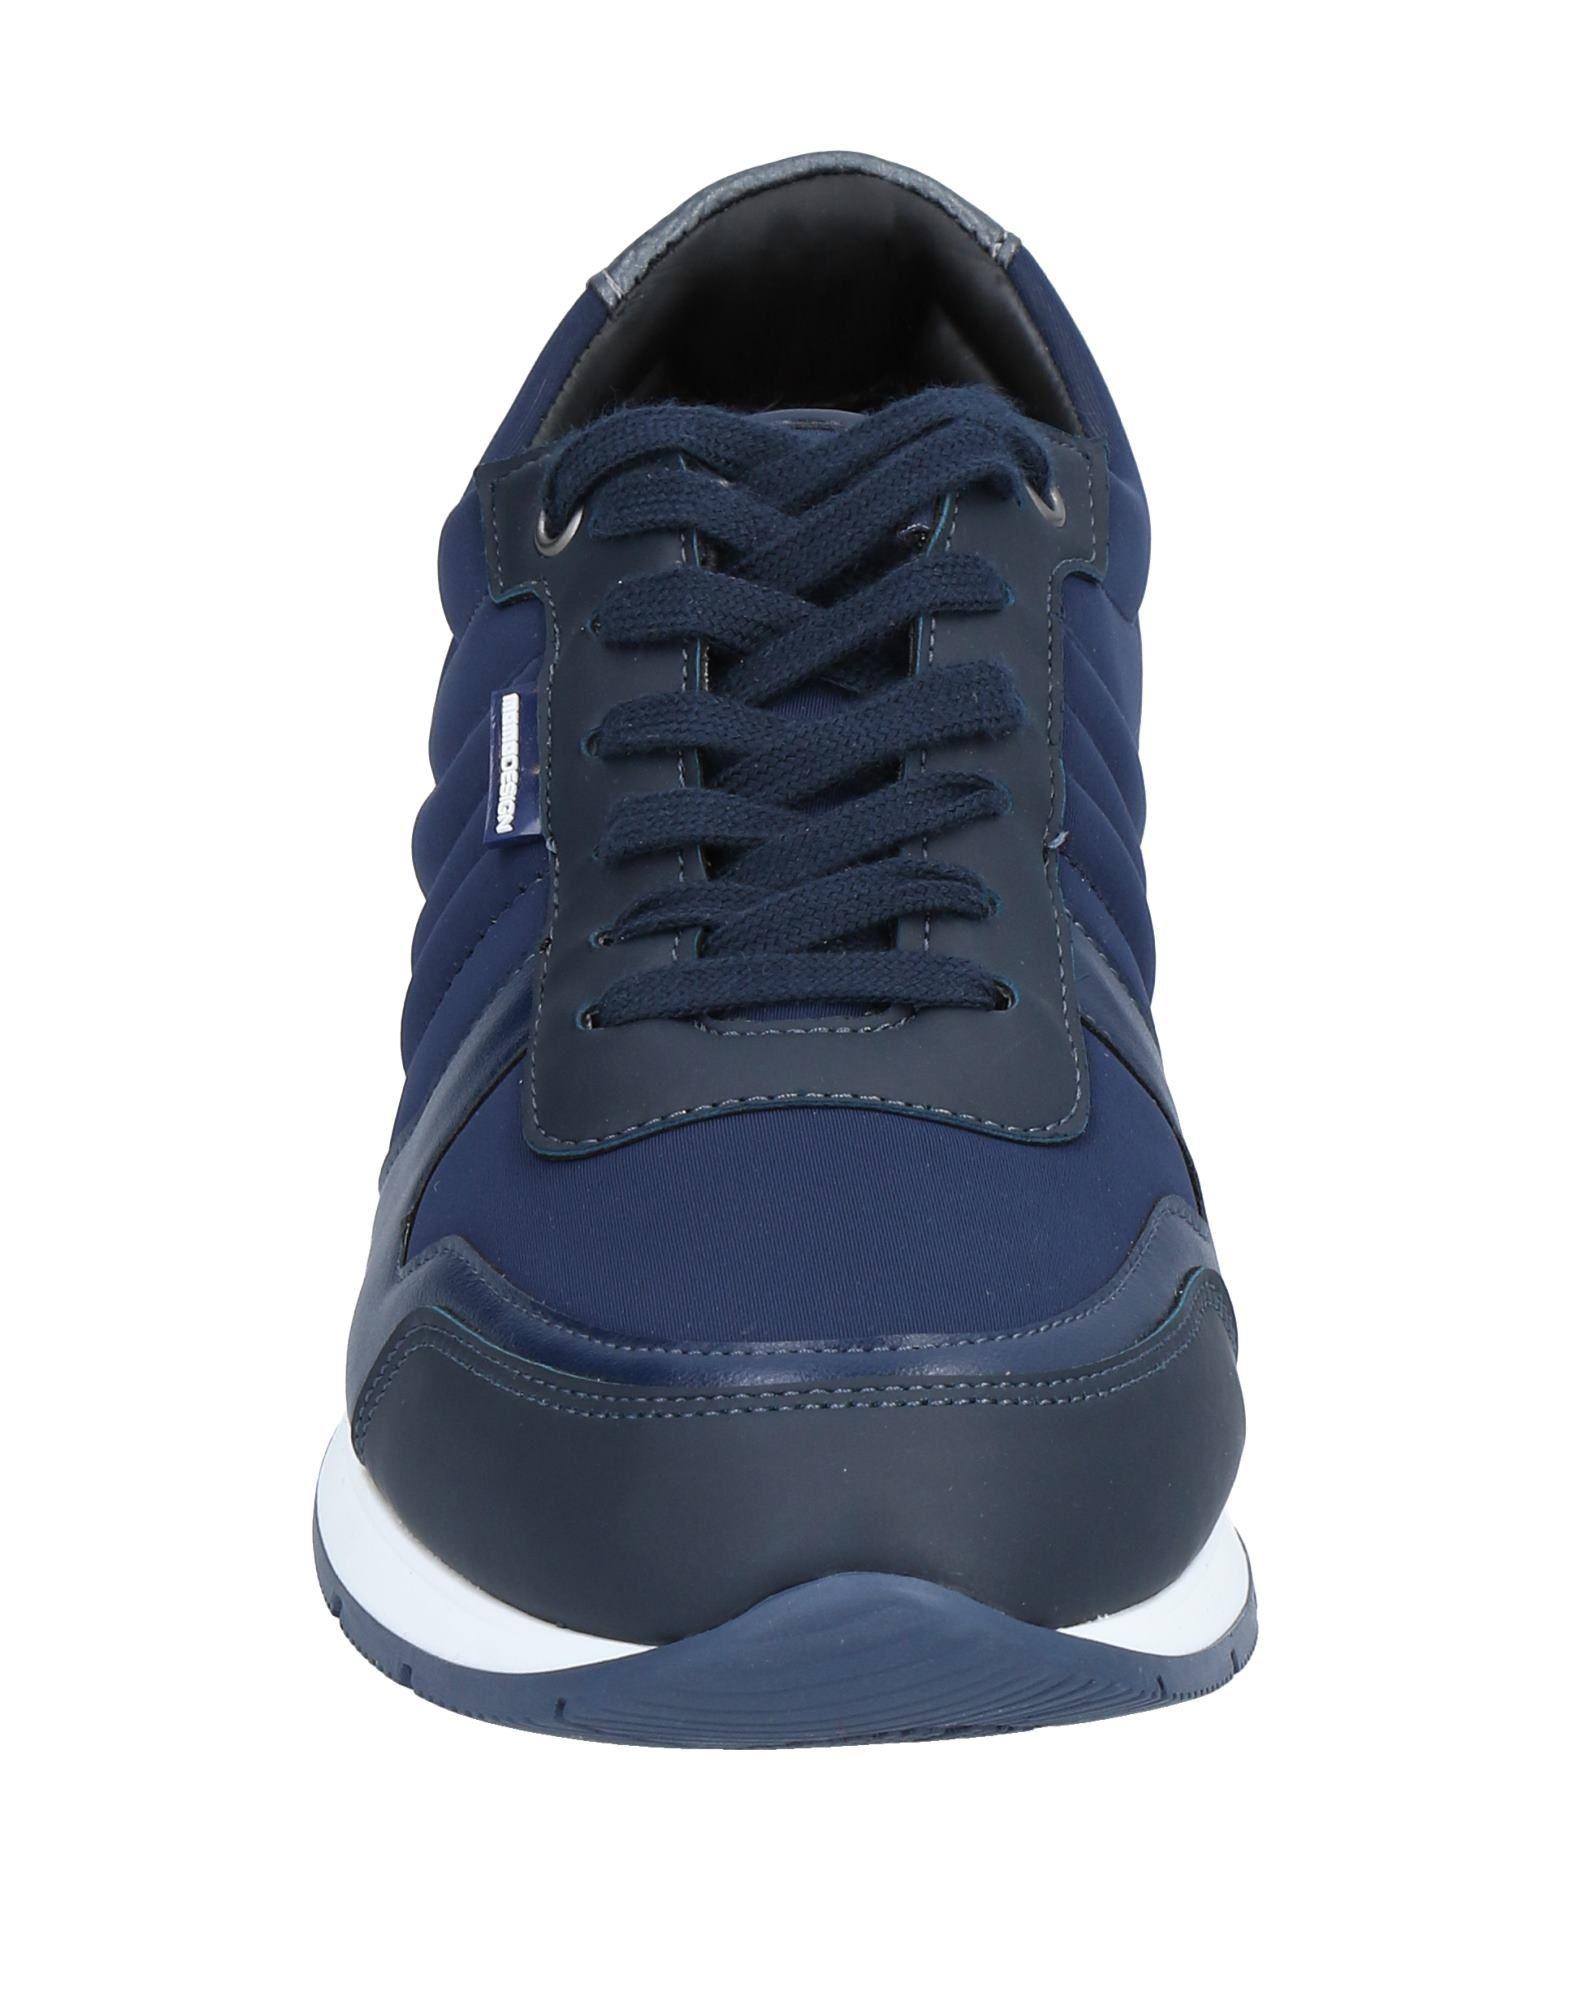 Momo on Design Sneakers - Women Momo Design Sneakers online on Momo  Canada - 11535044BC 4a6285